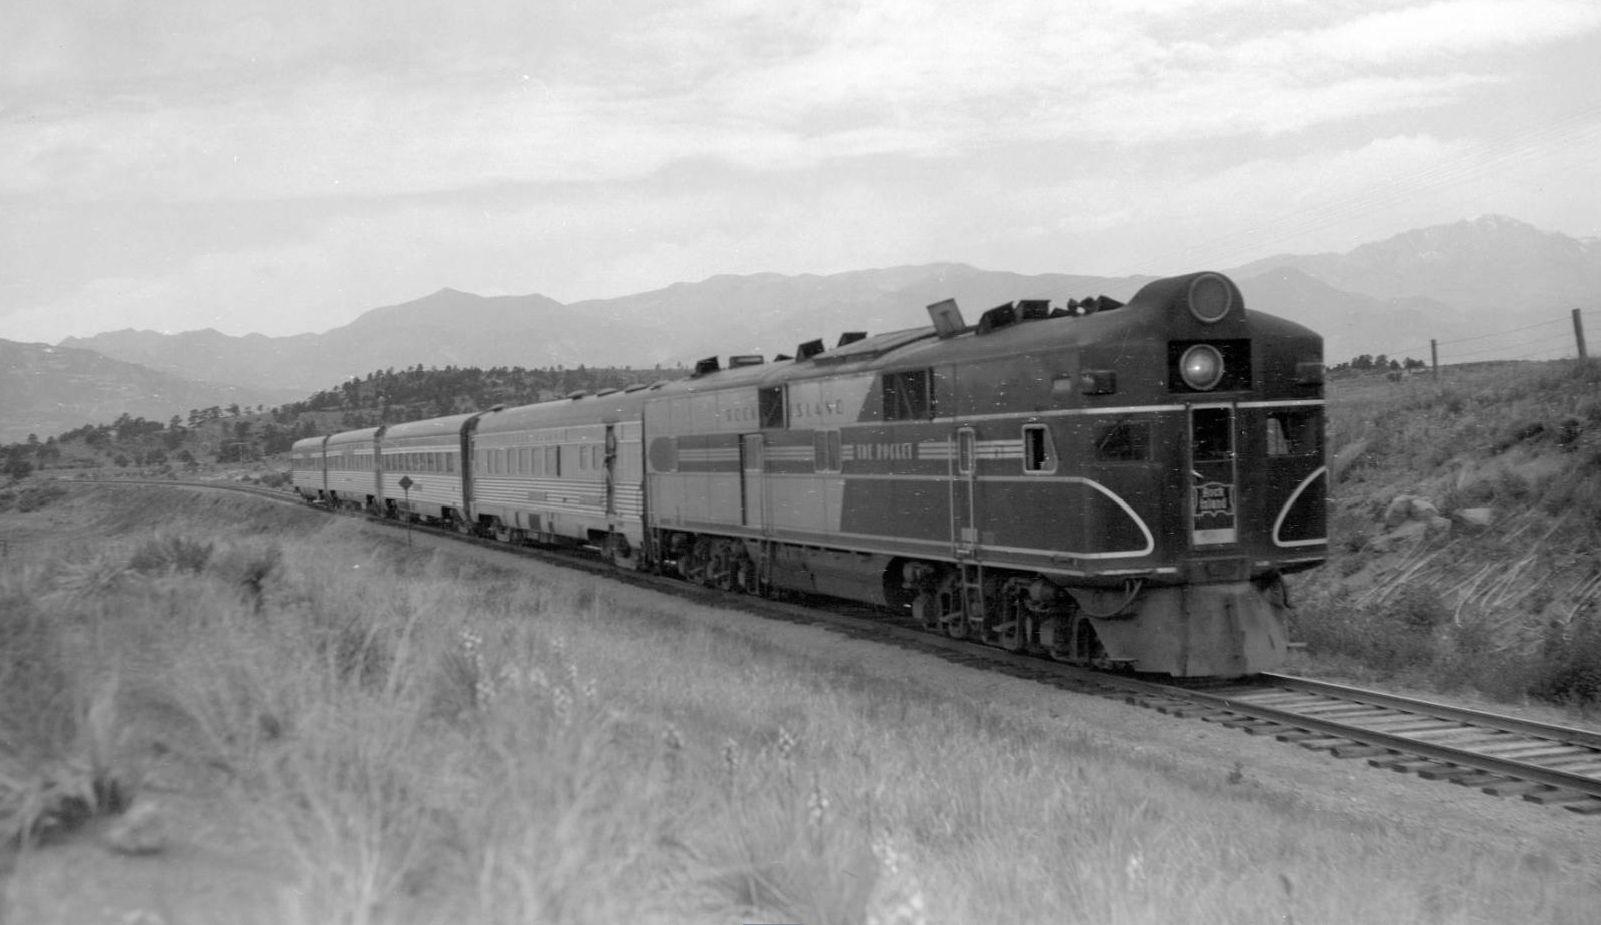 rocky mountain rocket consists - Google Search   Railways: North ...